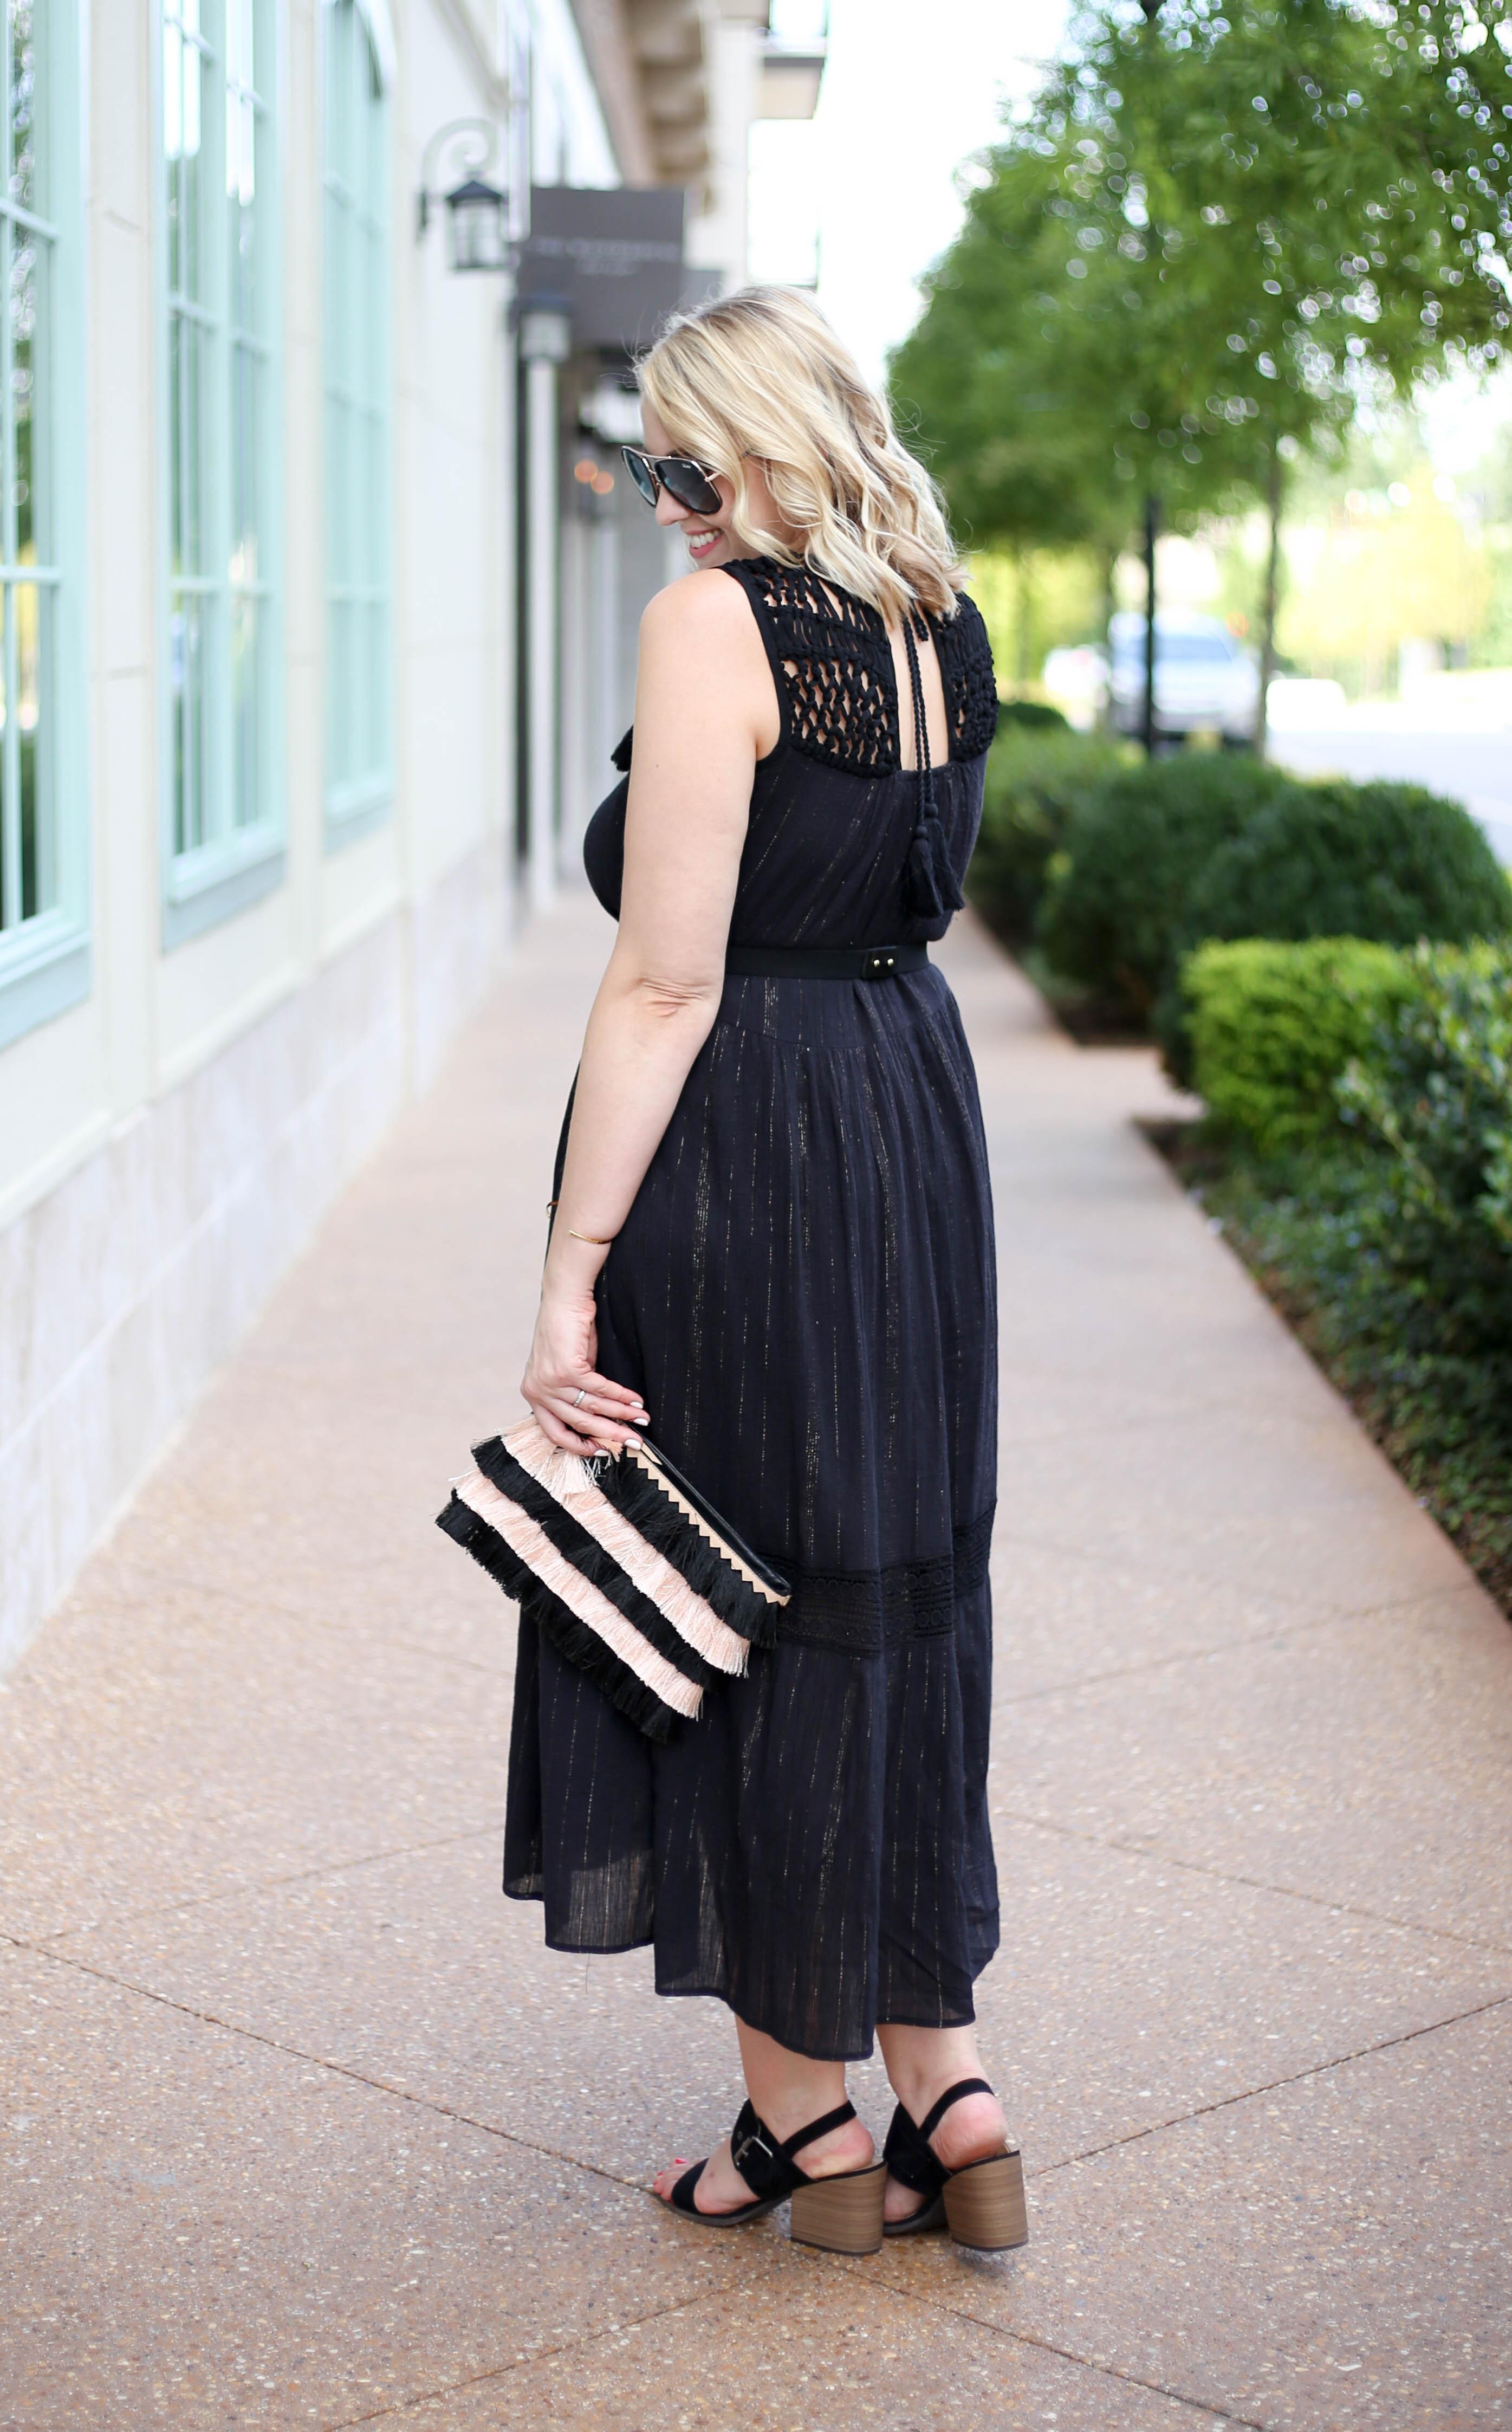 black crochet maxi dress #bohostyle #crochet #styleblogger